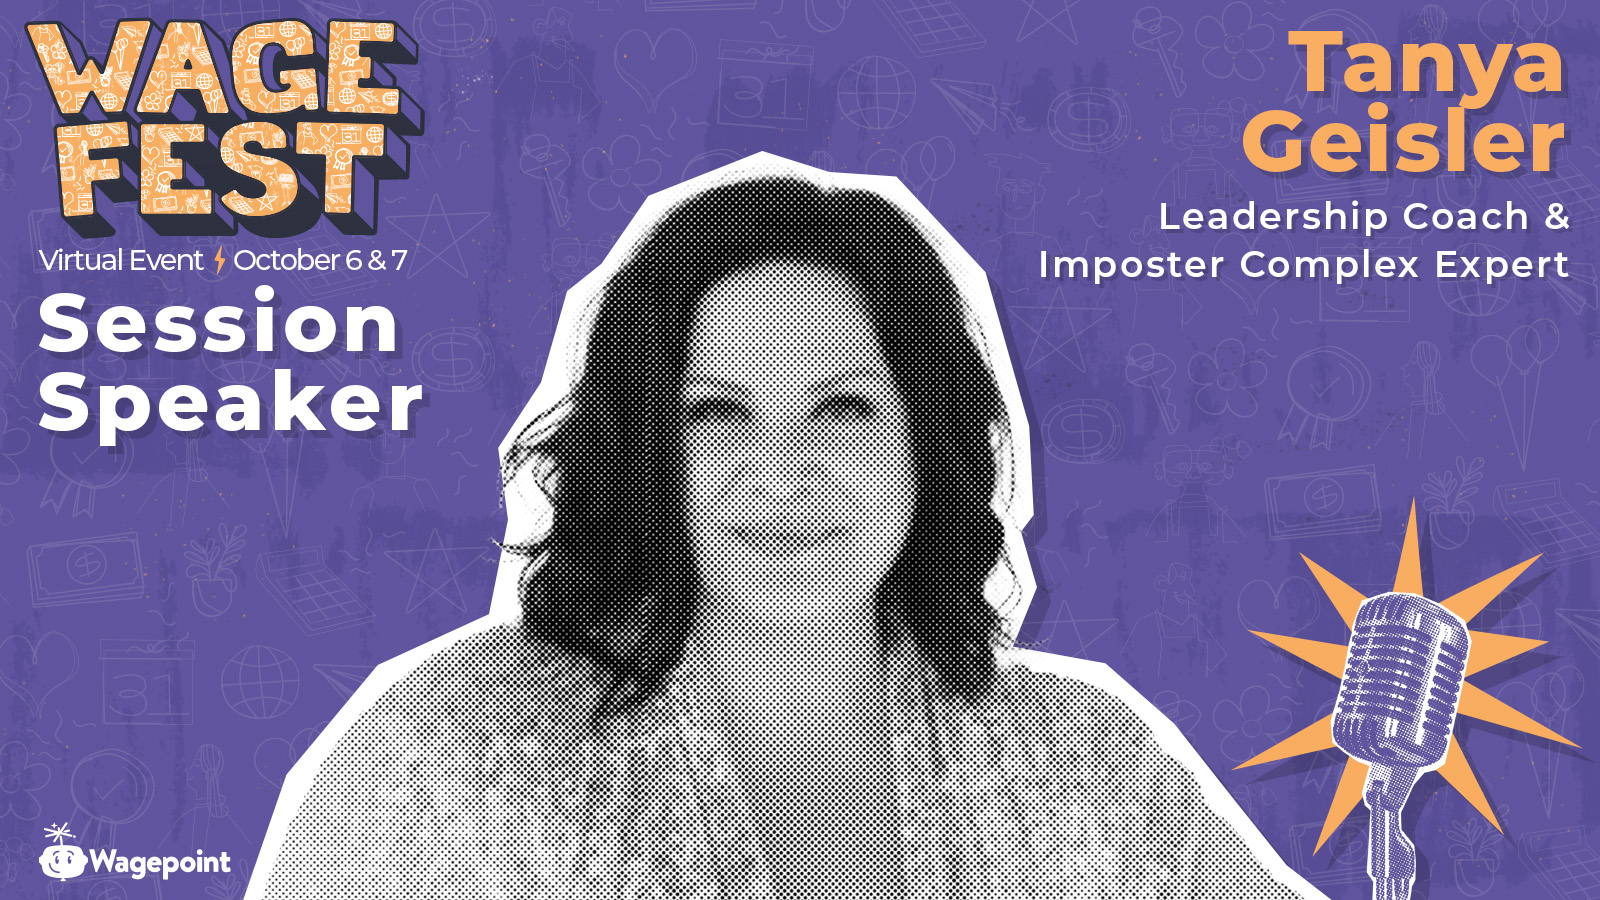 Tanya Geisler, Navigating the Imposter Complex